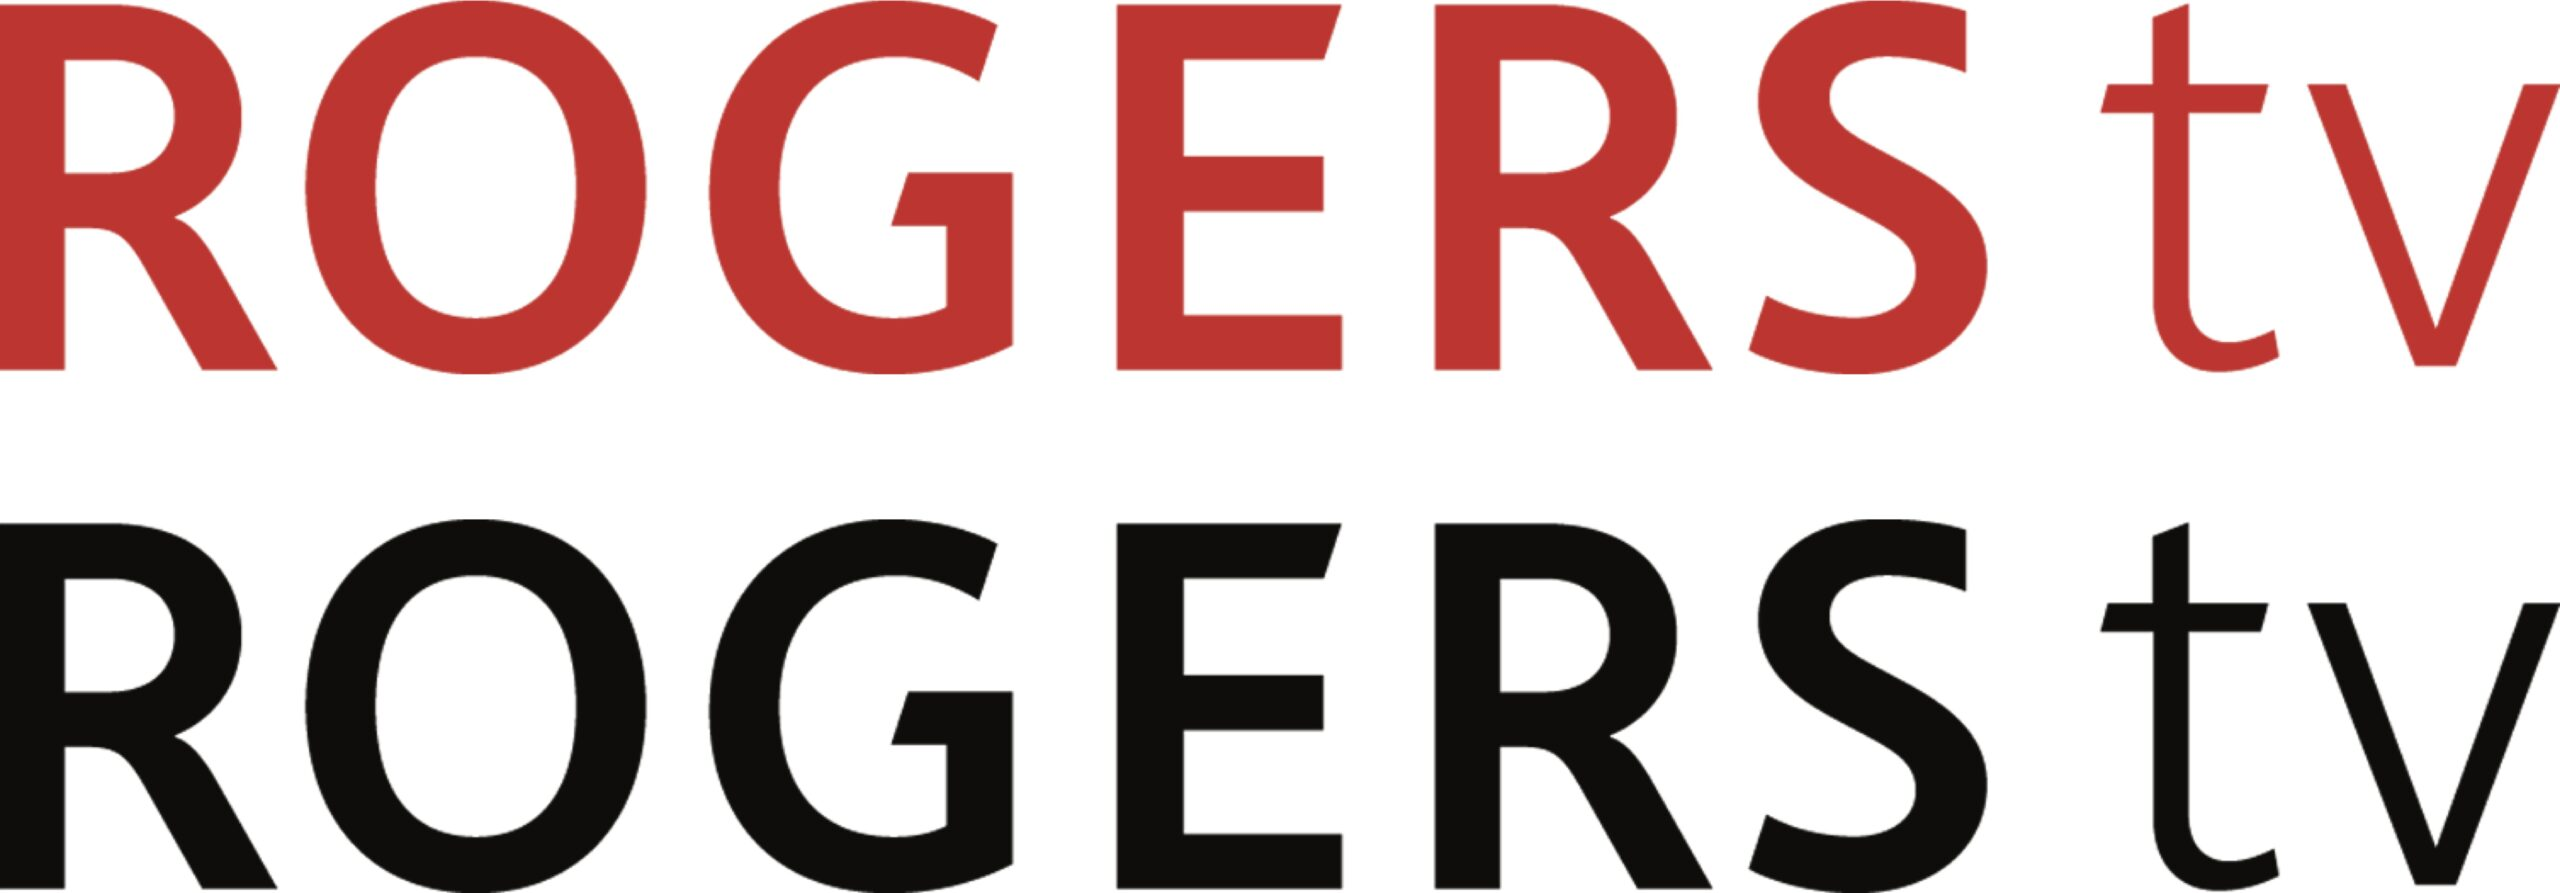 ROGERS TV LOGOS